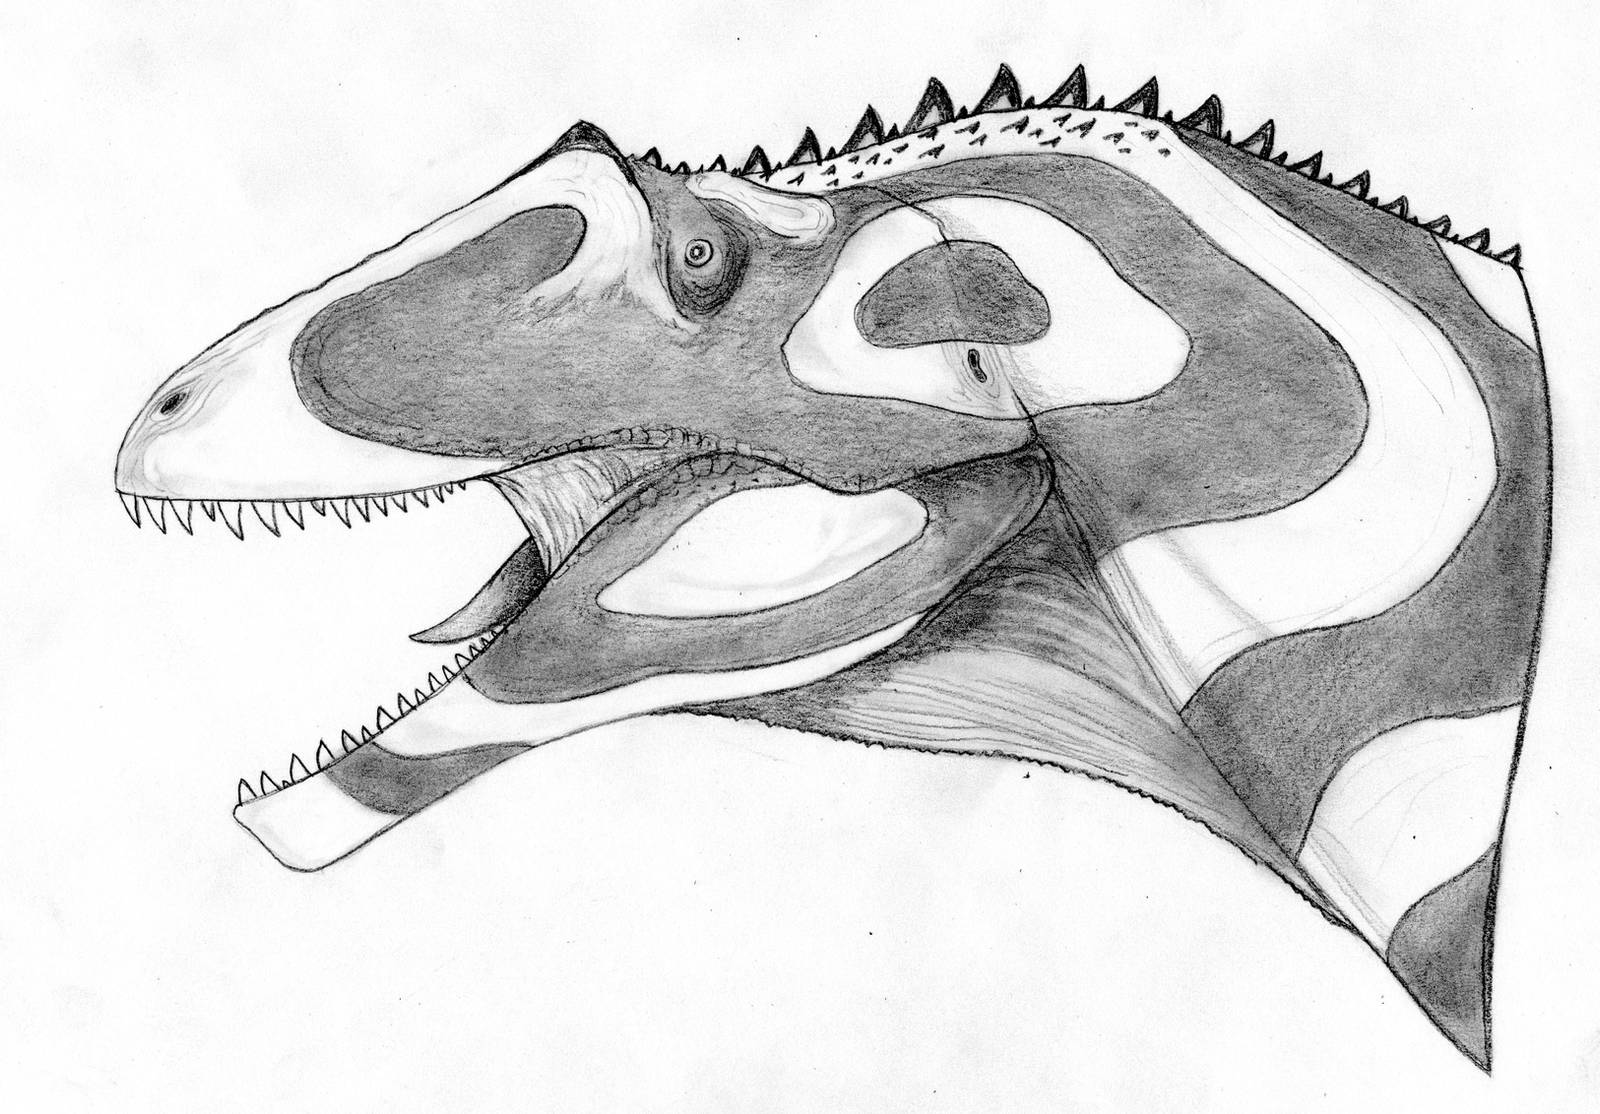 Saurophaganax maximus by Fragillimus335